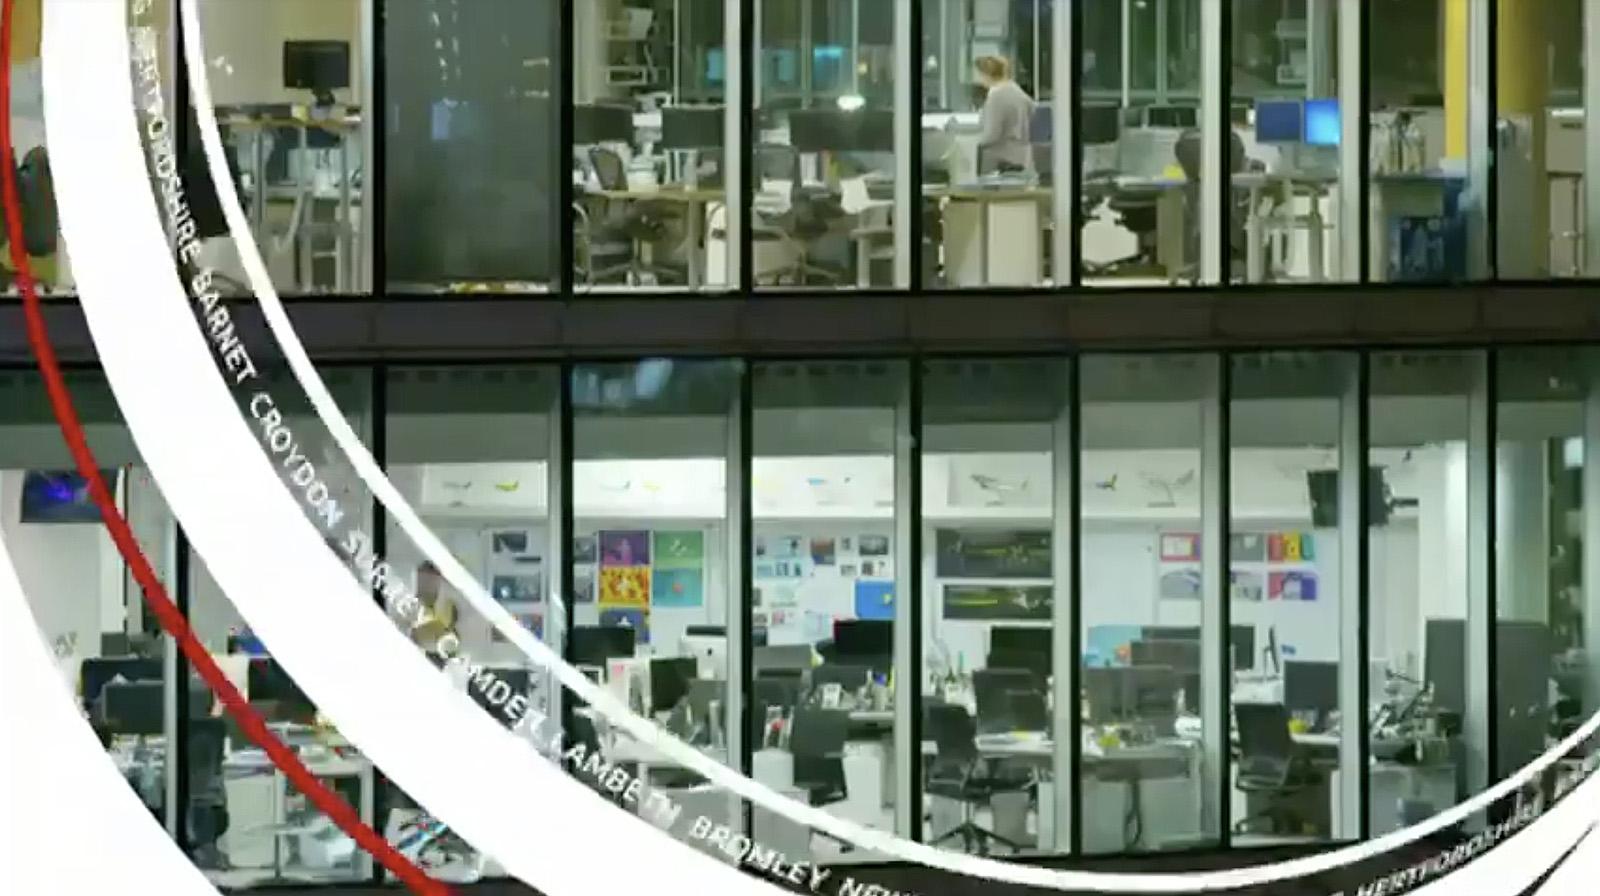 NCS_BBC-Rebrand-Reith-2019_051